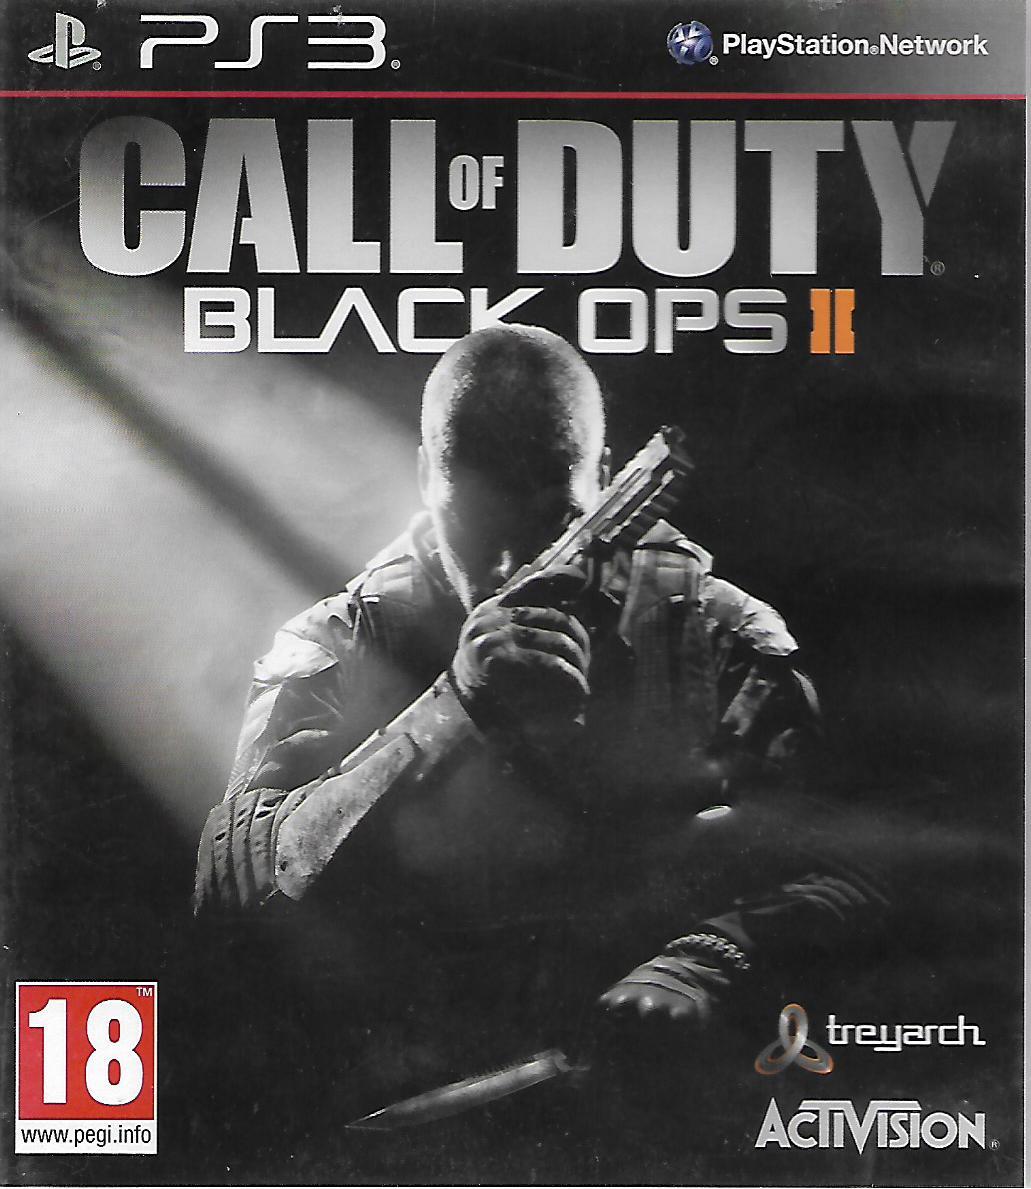 CALL OF DUTY - BLACK OPS II (PS3 - bazar)